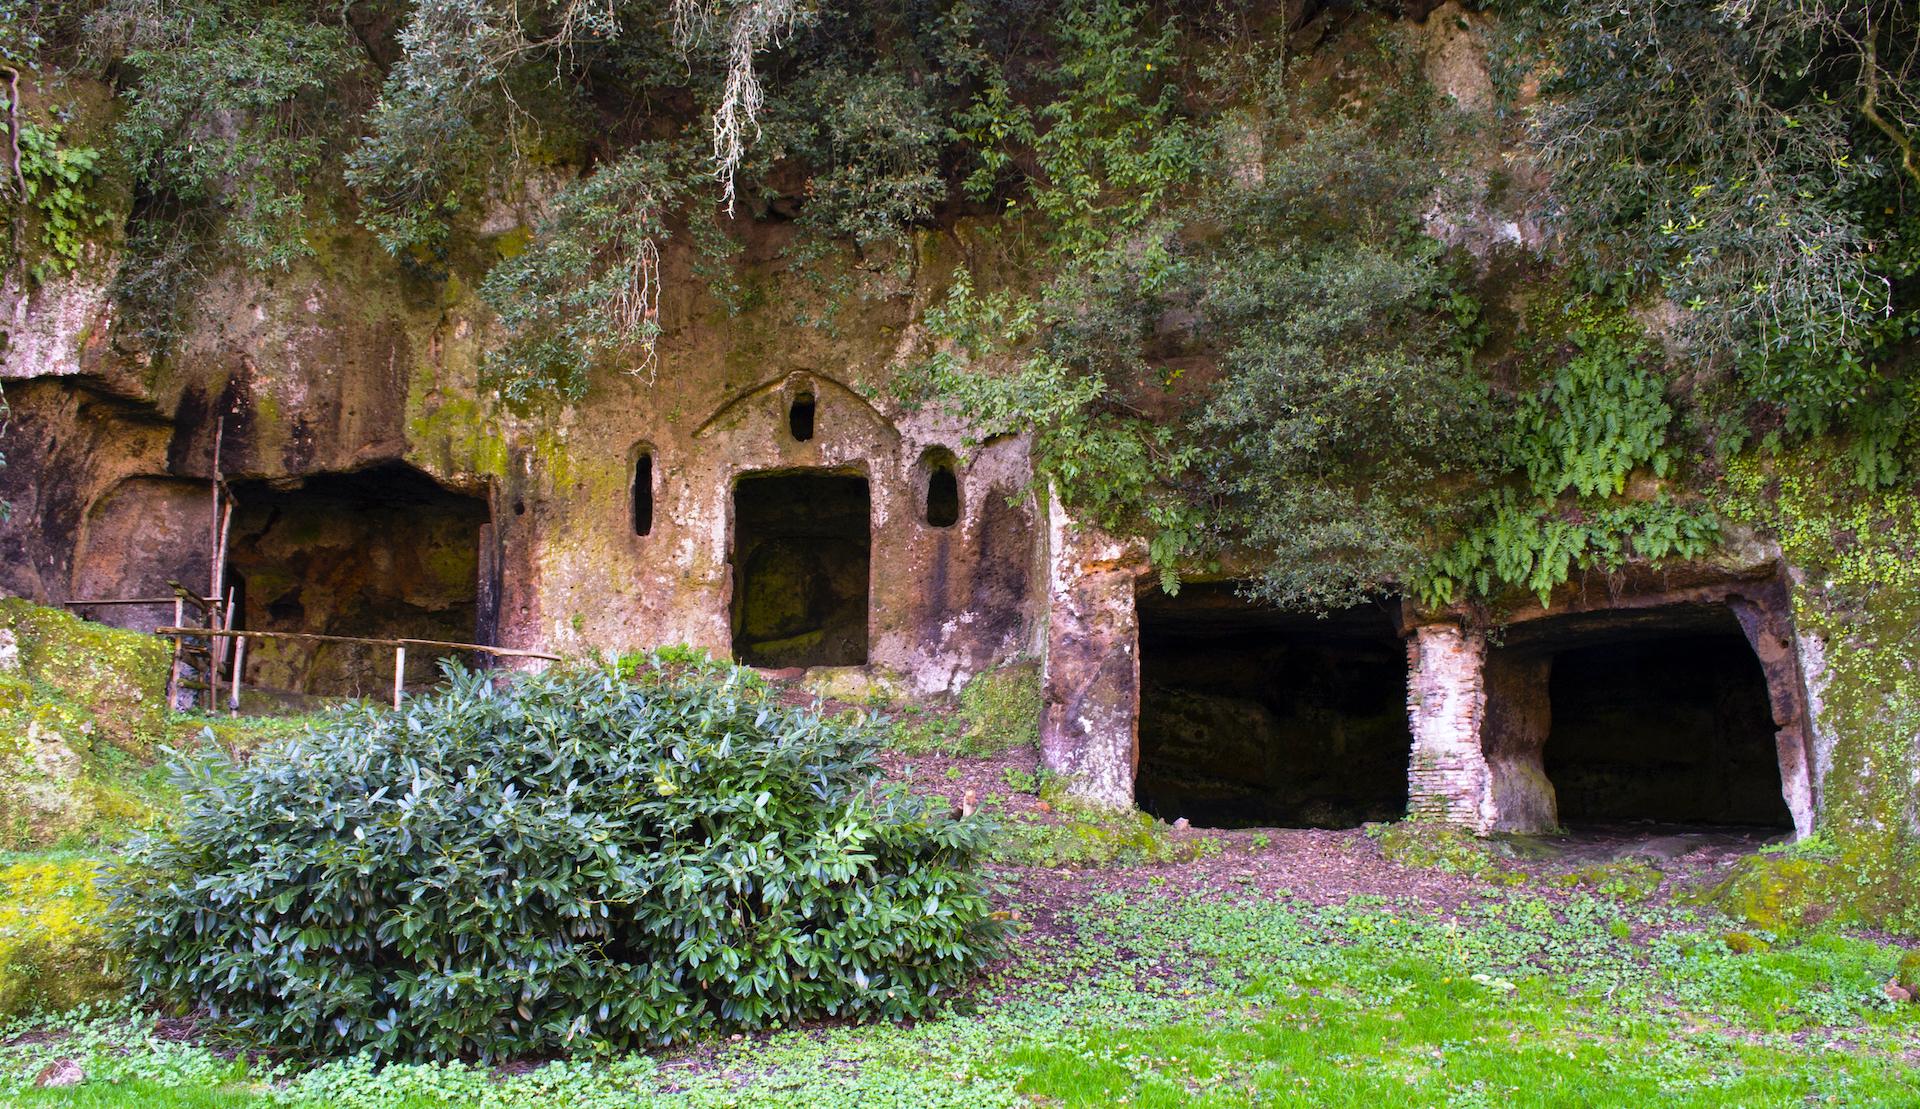 le residenze a firenze trekking tombe etrusche